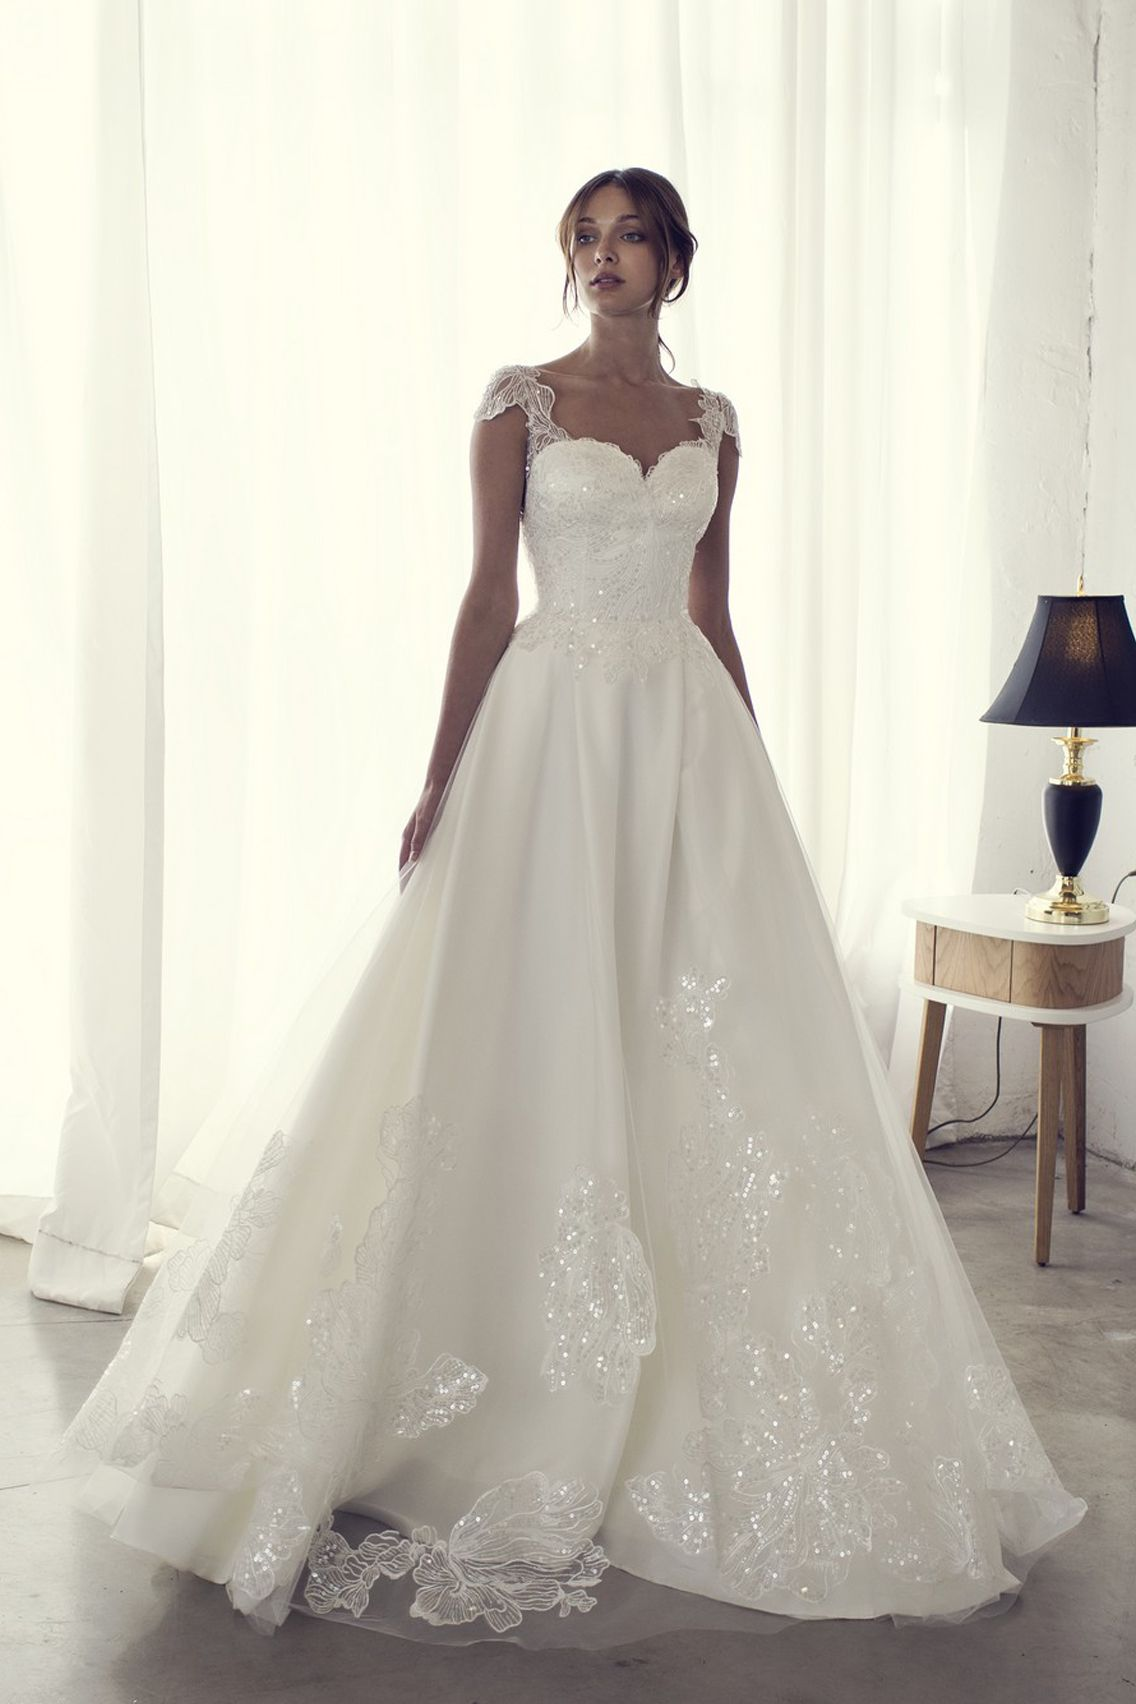 Pin By Corona Bonow On Wedding Dresses Bridal Dresses Wedding Dresses Designer Wedding Dresses